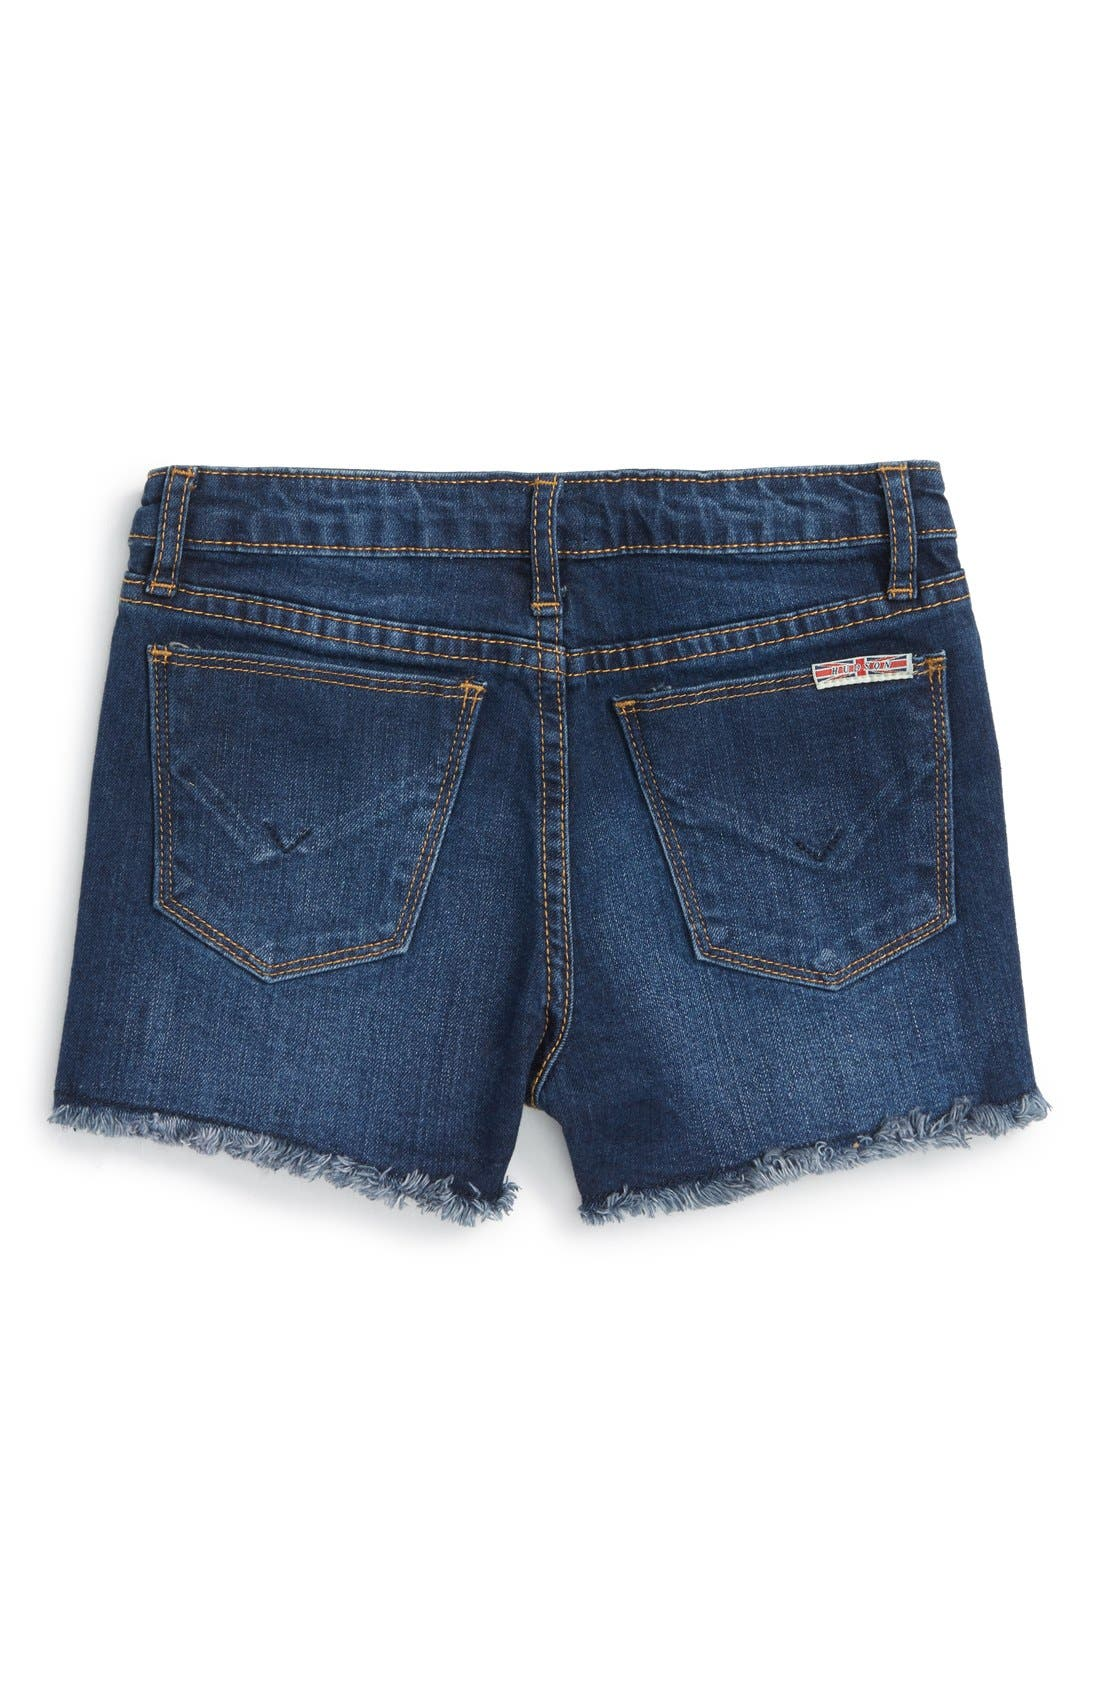 Alternate Image 2  - Hudson Kids Cutoff Denim Shorts (Toddler Girls & Little Girls)